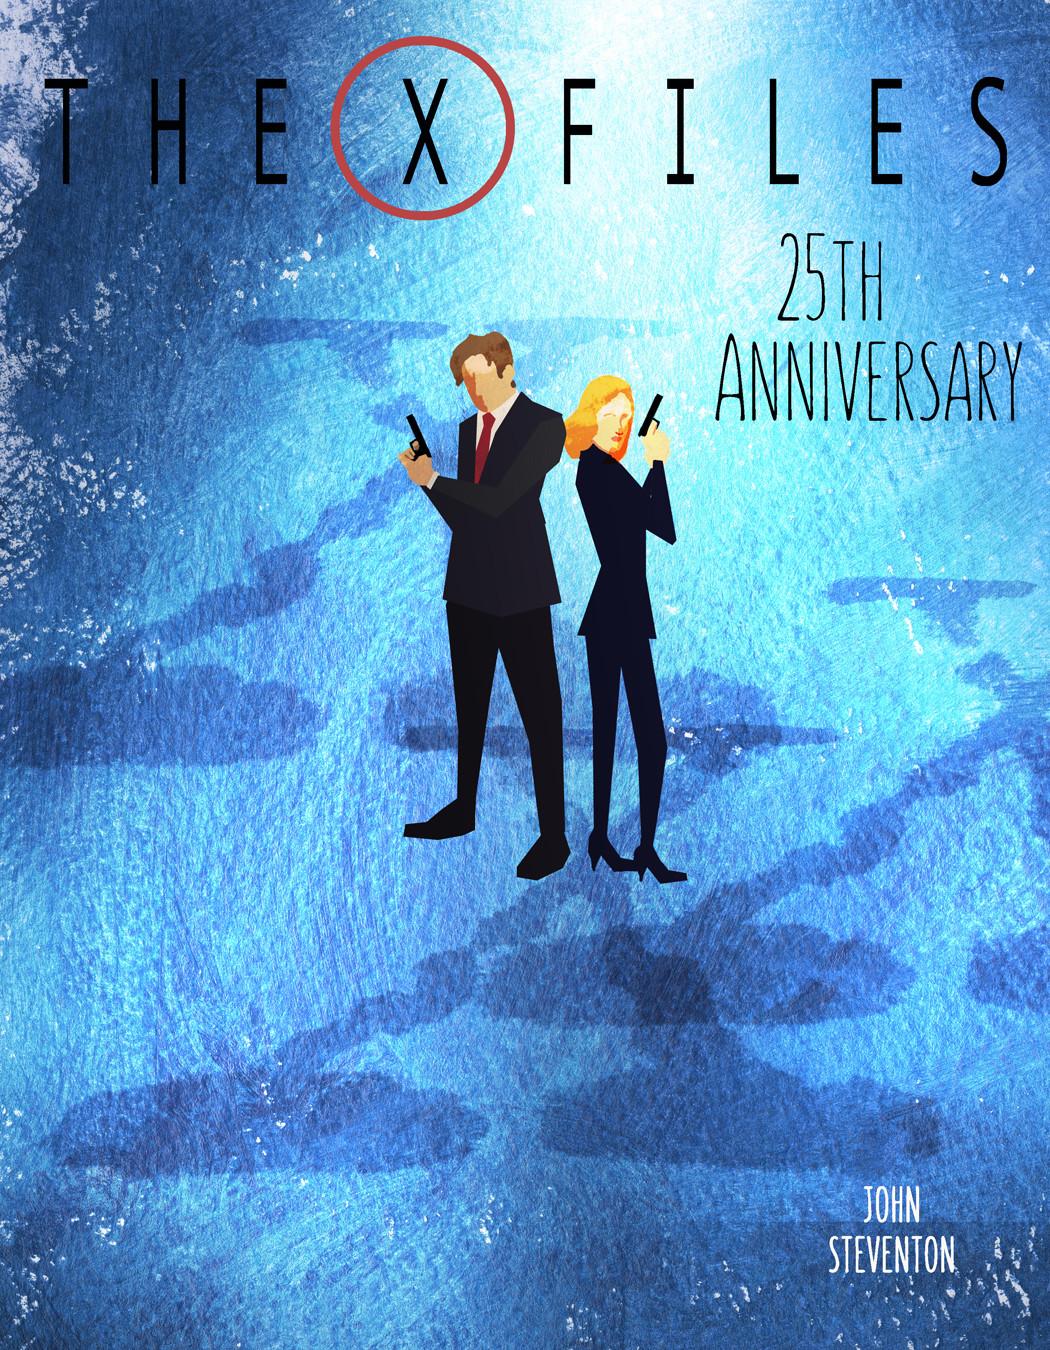 X-Files Anniversary Art: Modified for SDCC 2018 Souvenir Book